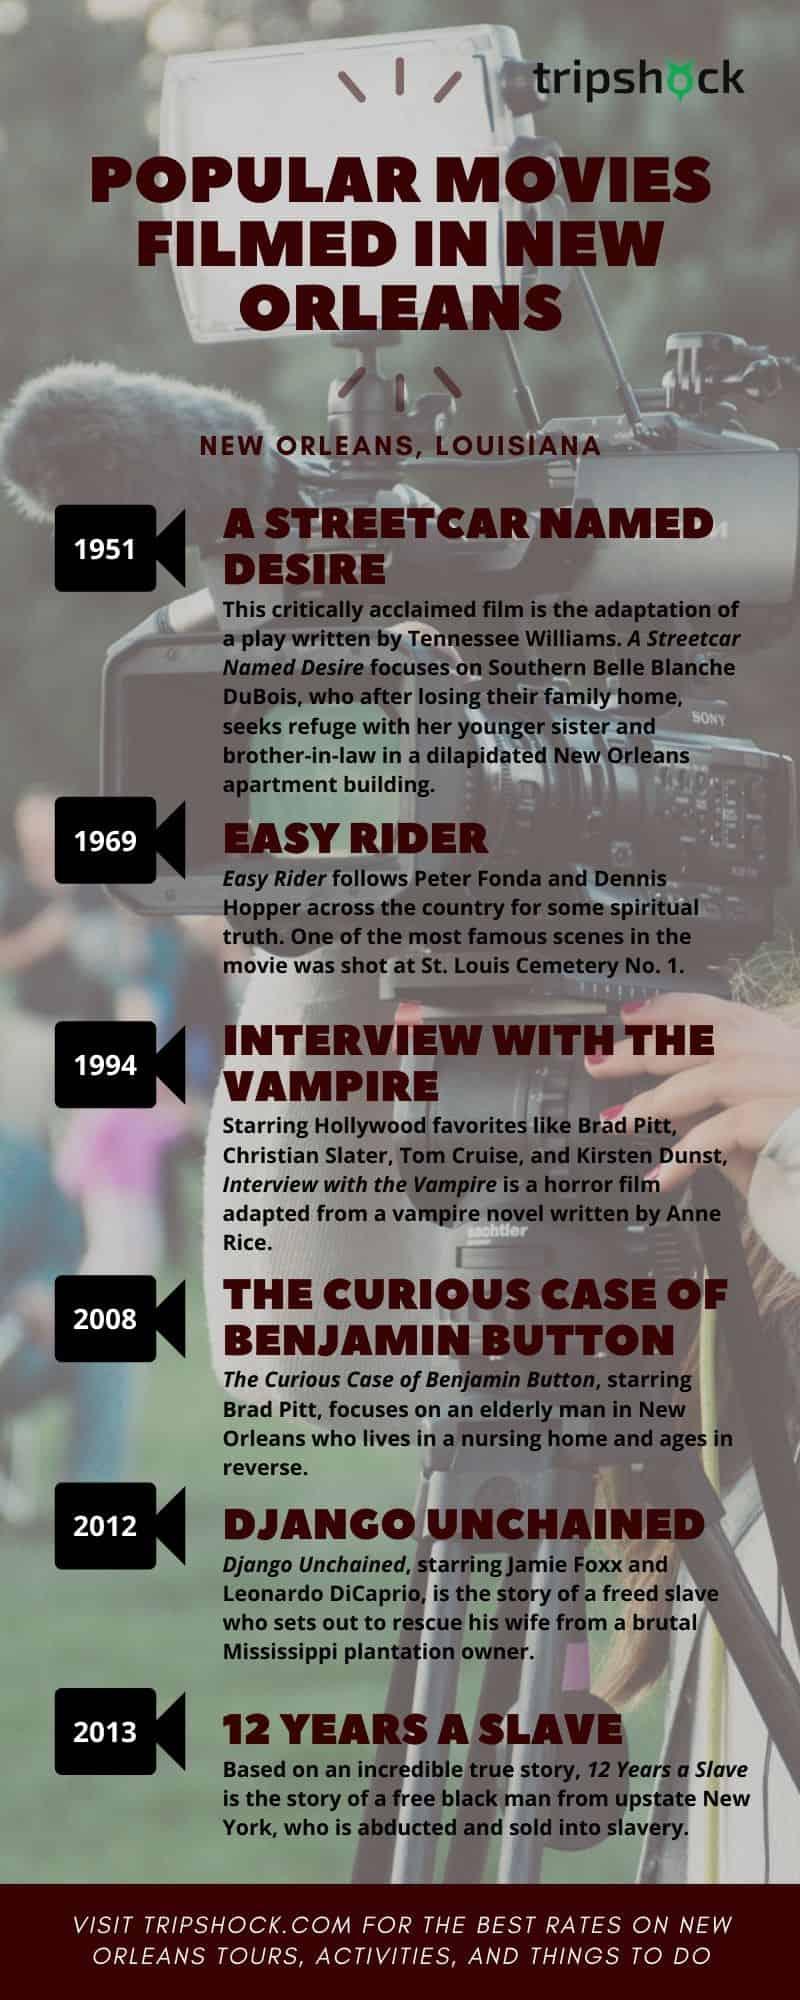 popular movies filmed in new orleans